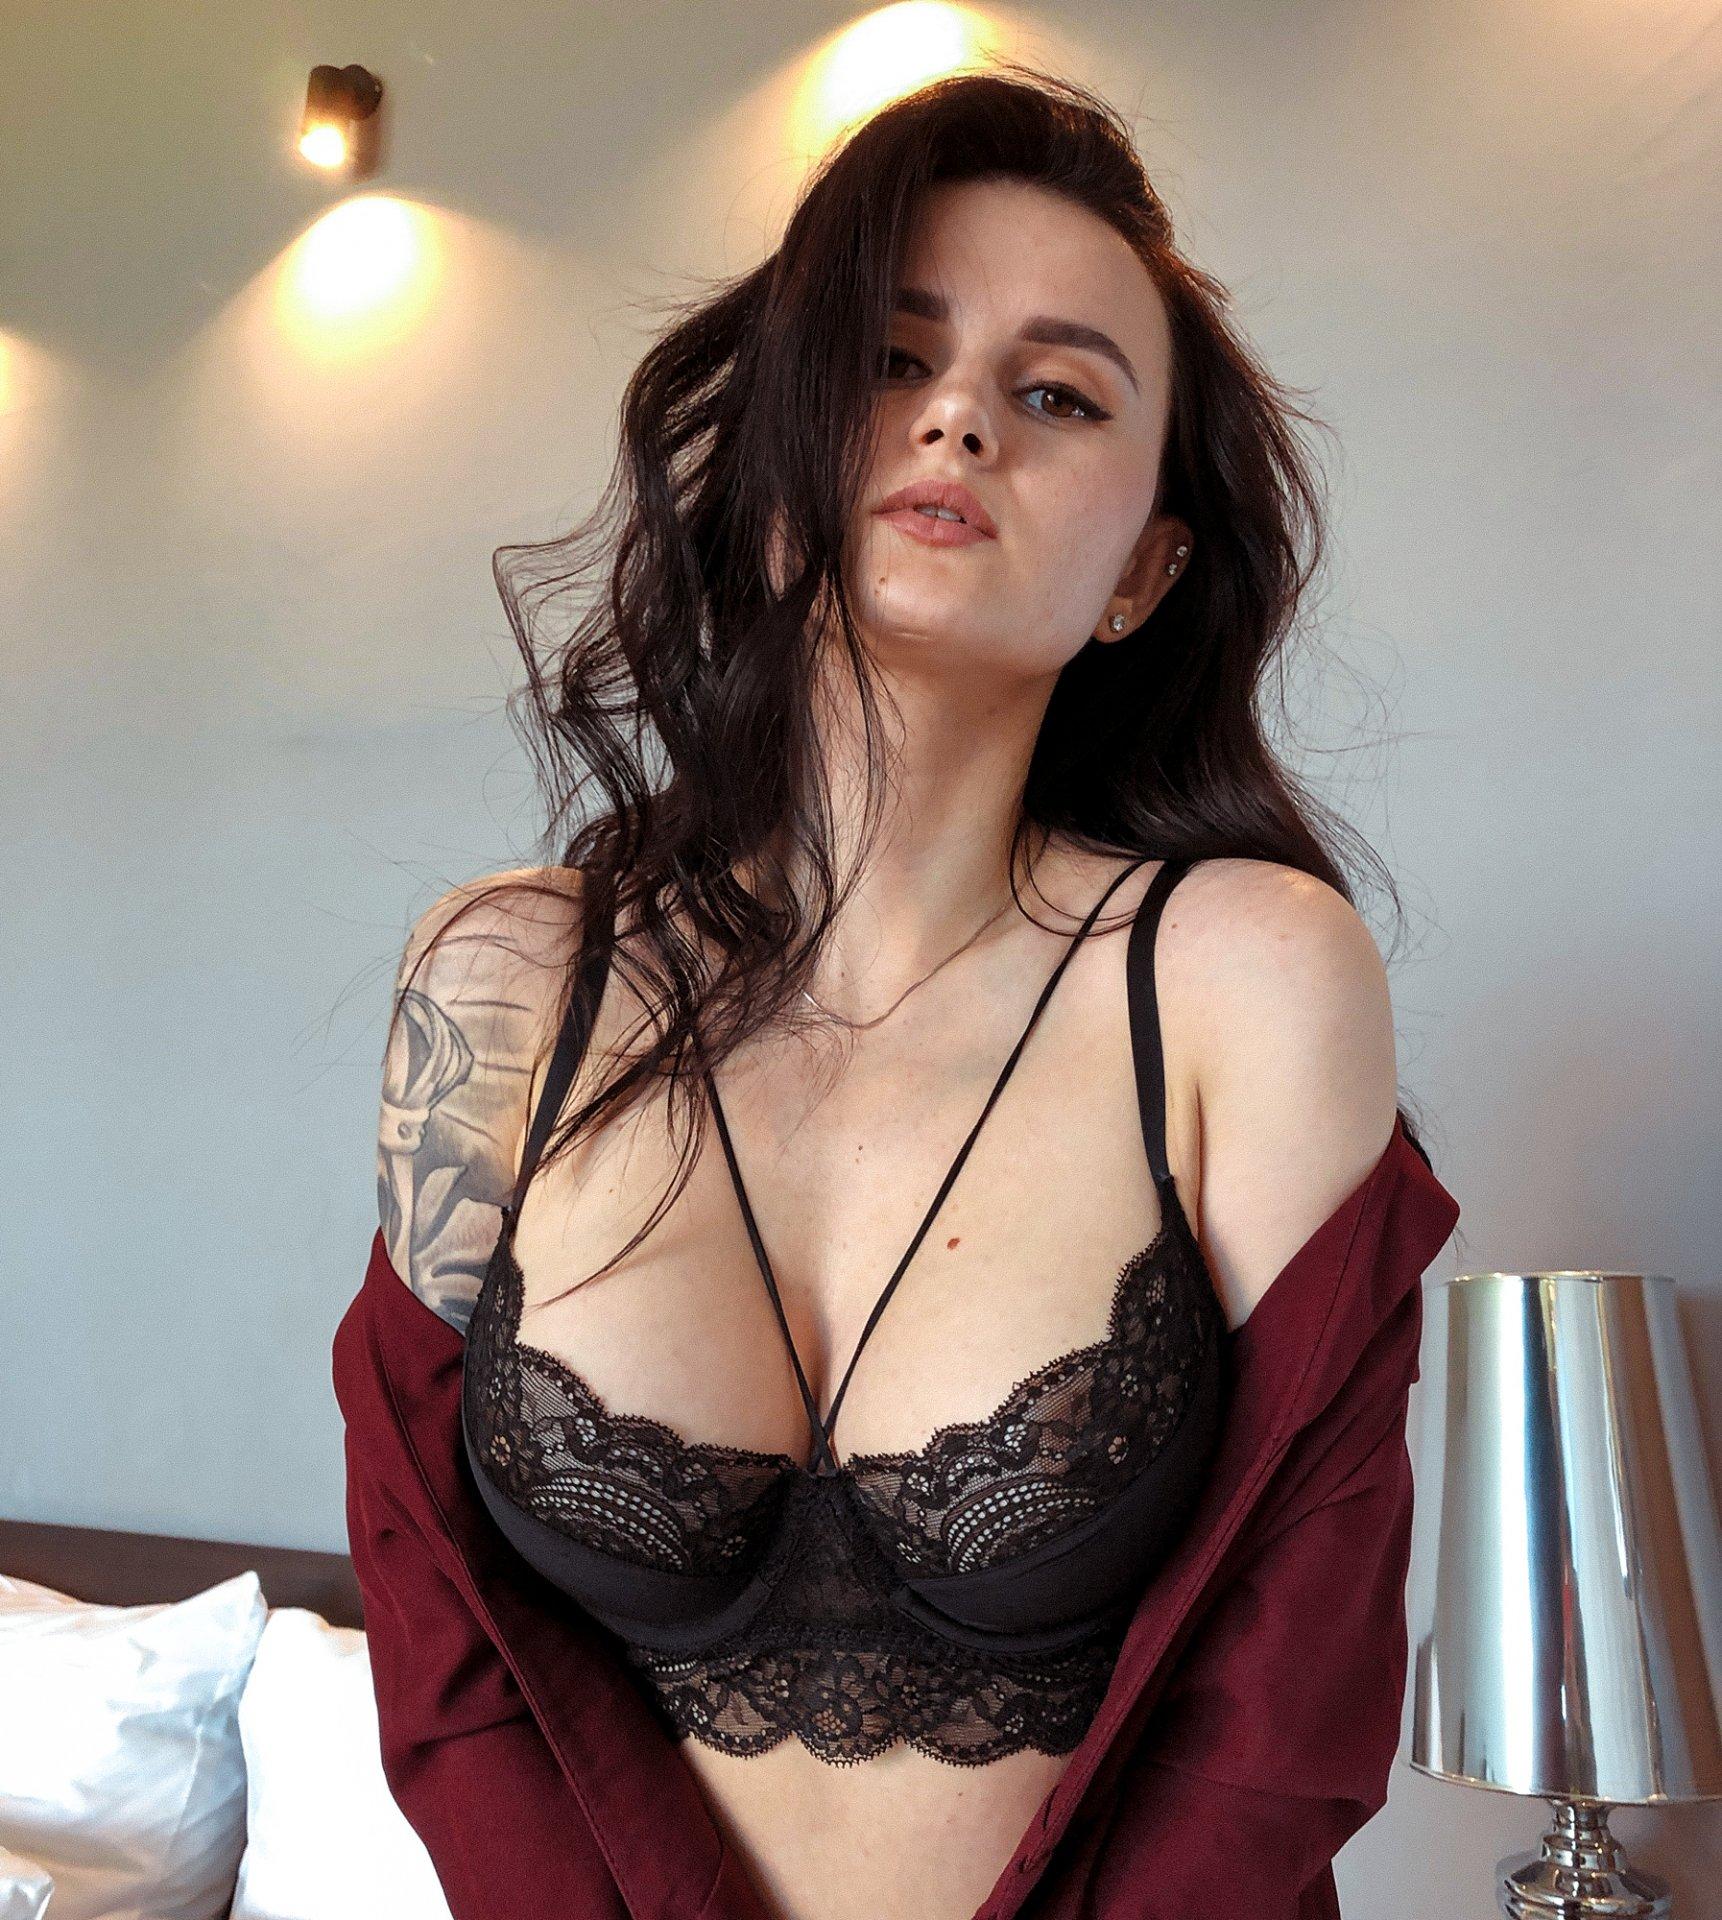 AudreyJ47 from Queensland,Australia